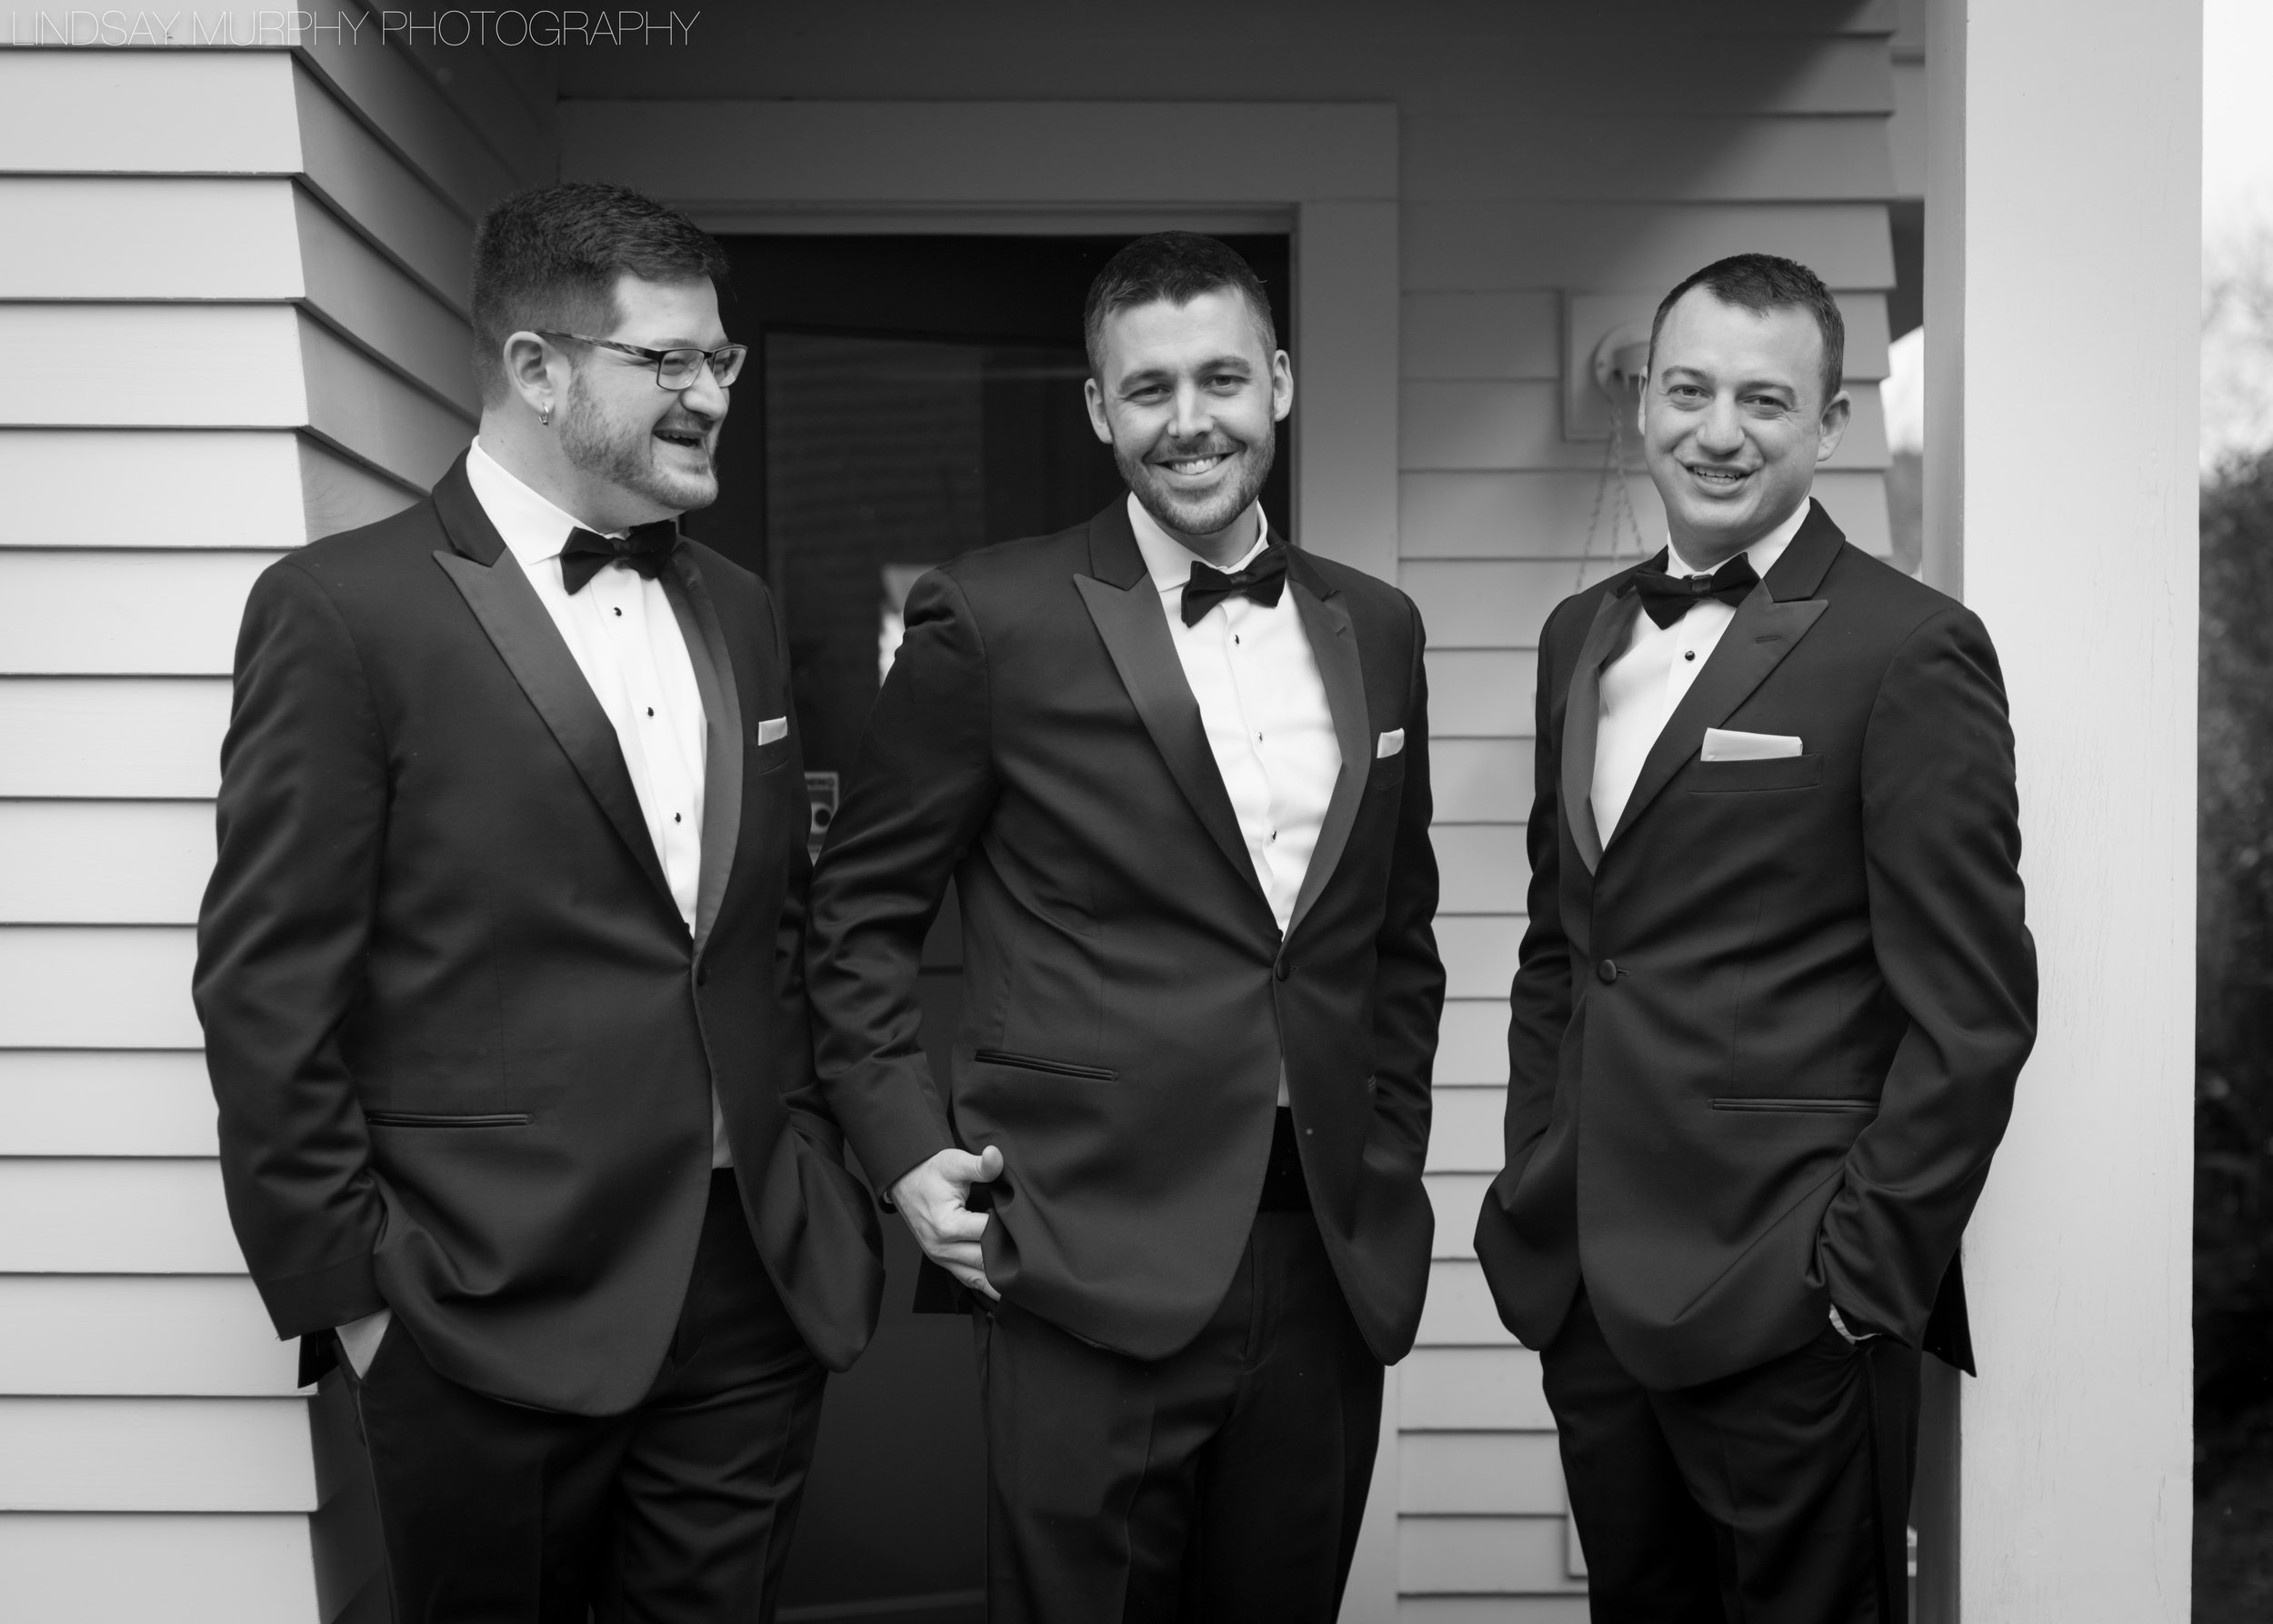 seattle_wedding_photography-45.jpg